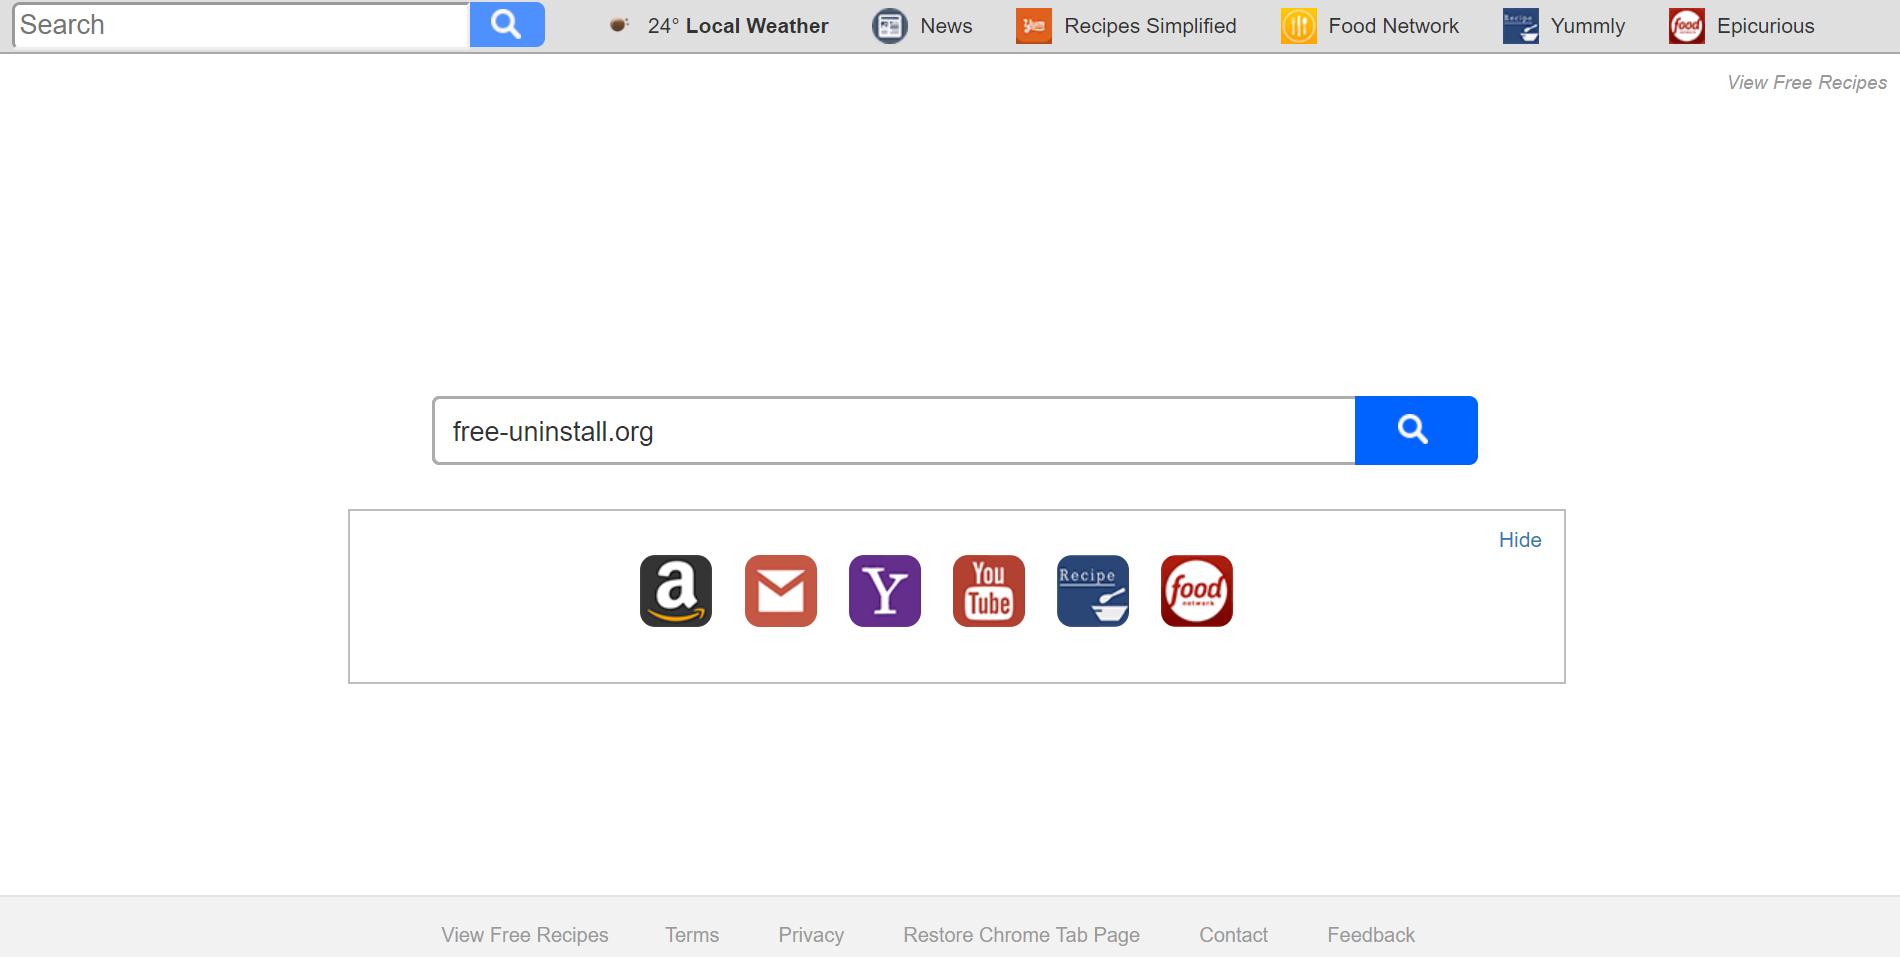 Search.searchvfr.com Hijacker